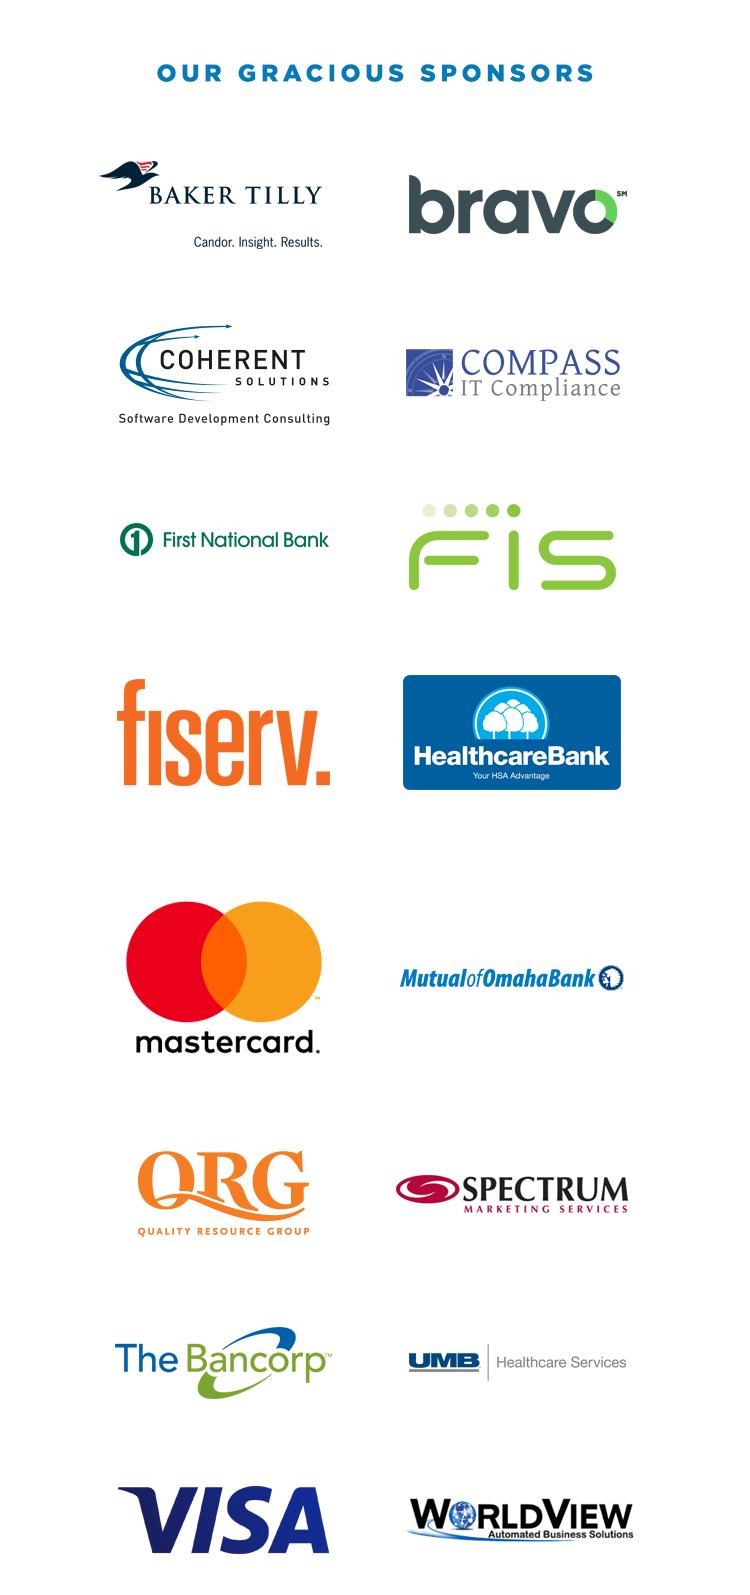 PC2017 Sponsor Logos